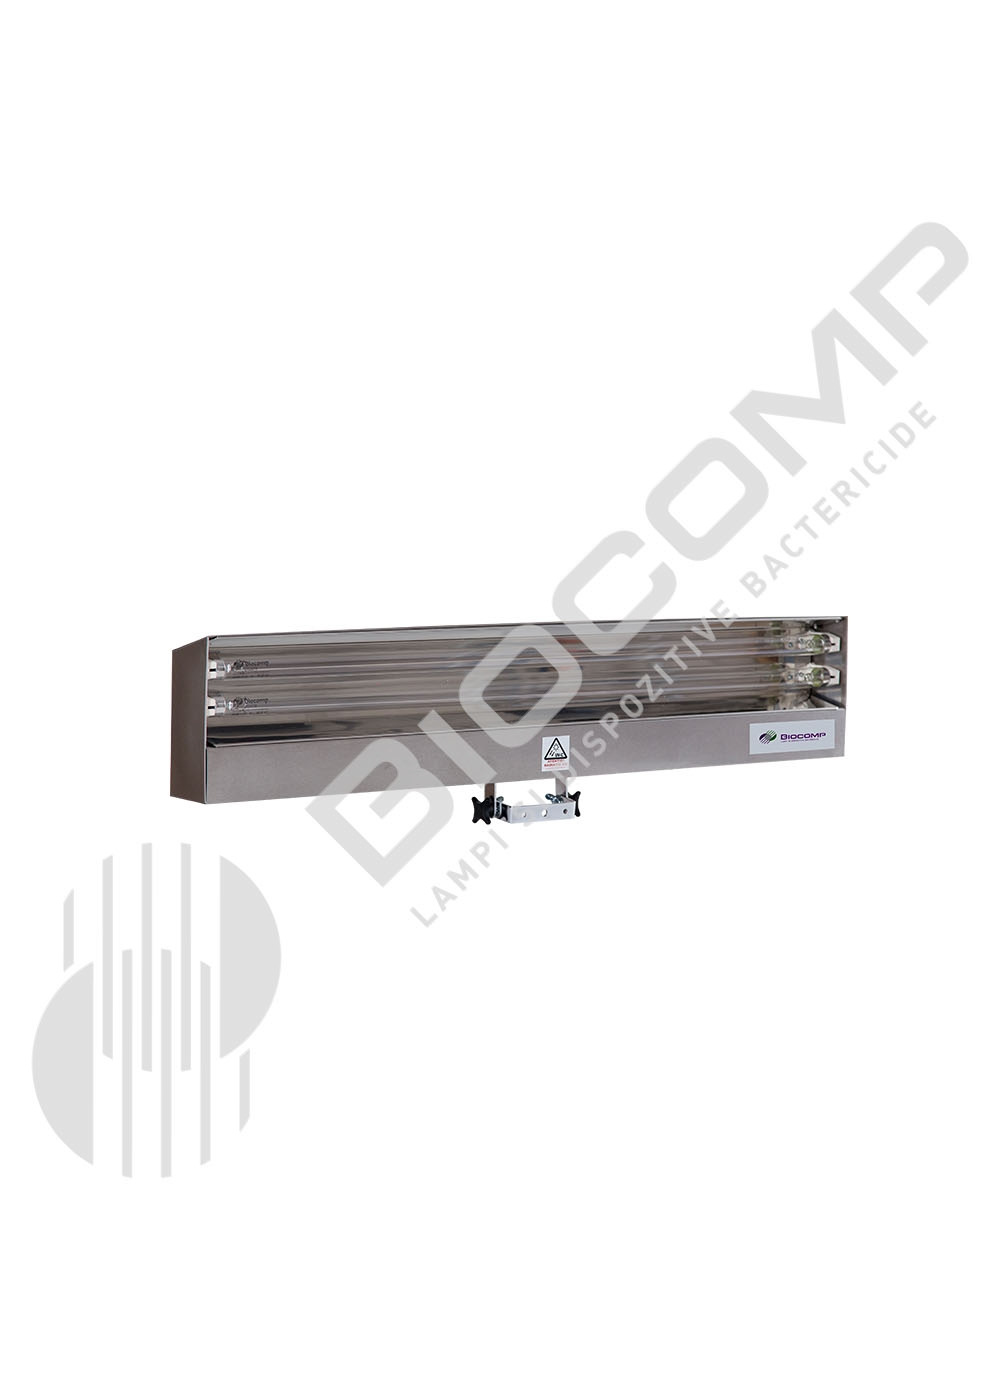 Lampa inox pentru perete LBAI-P